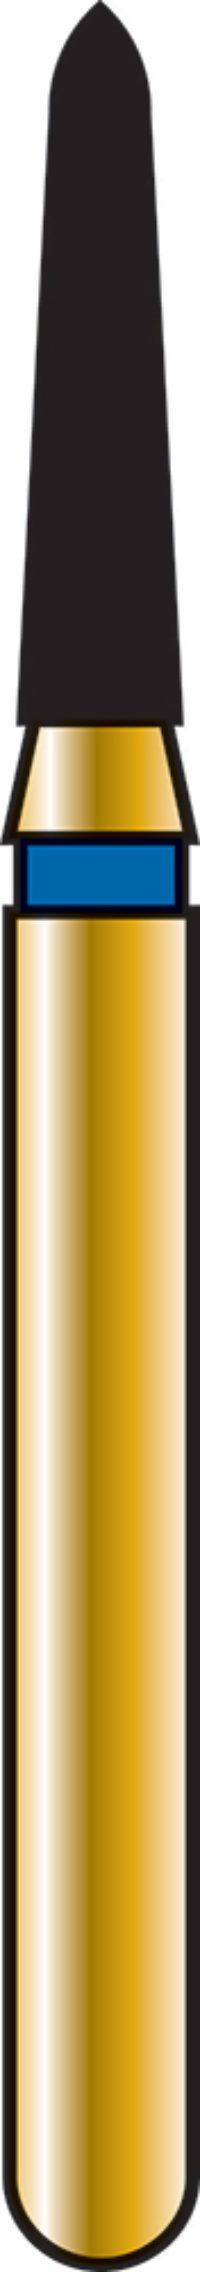 Pointed Taper 14-6mm Gold Diamond Bur